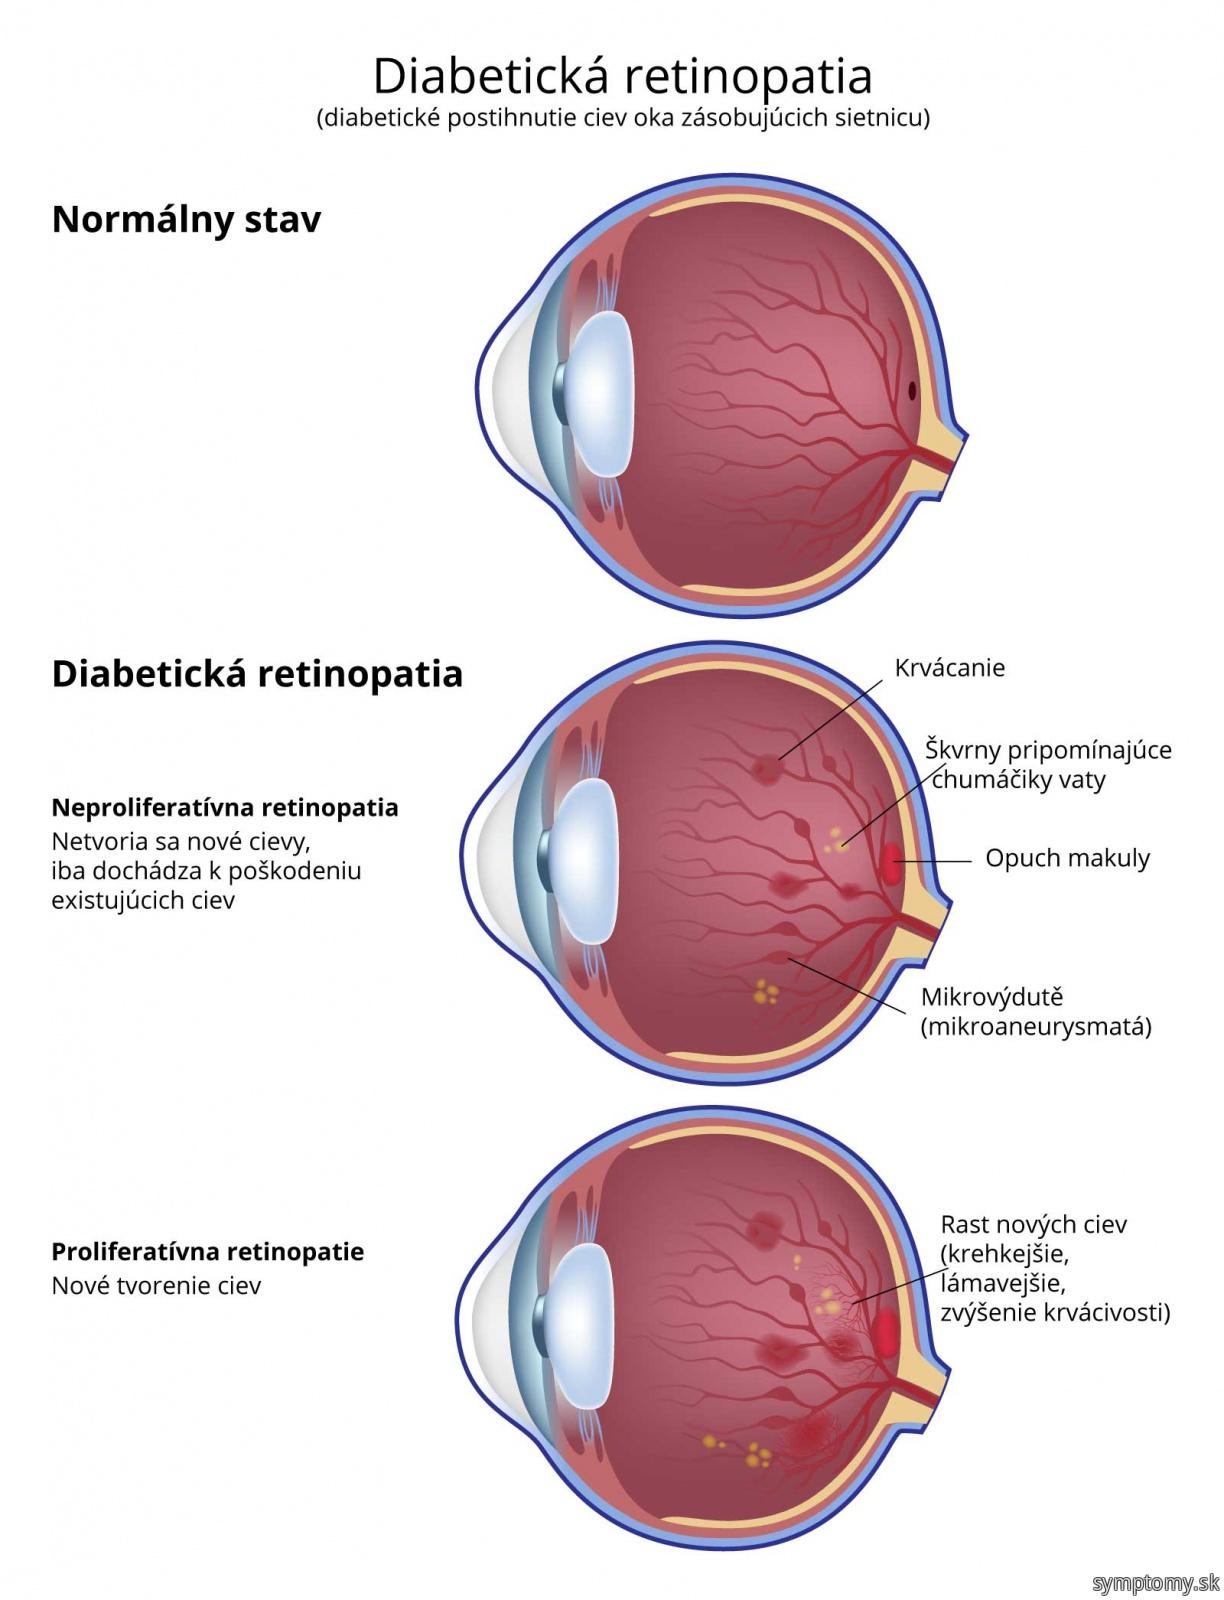 Diabetická retinopatia